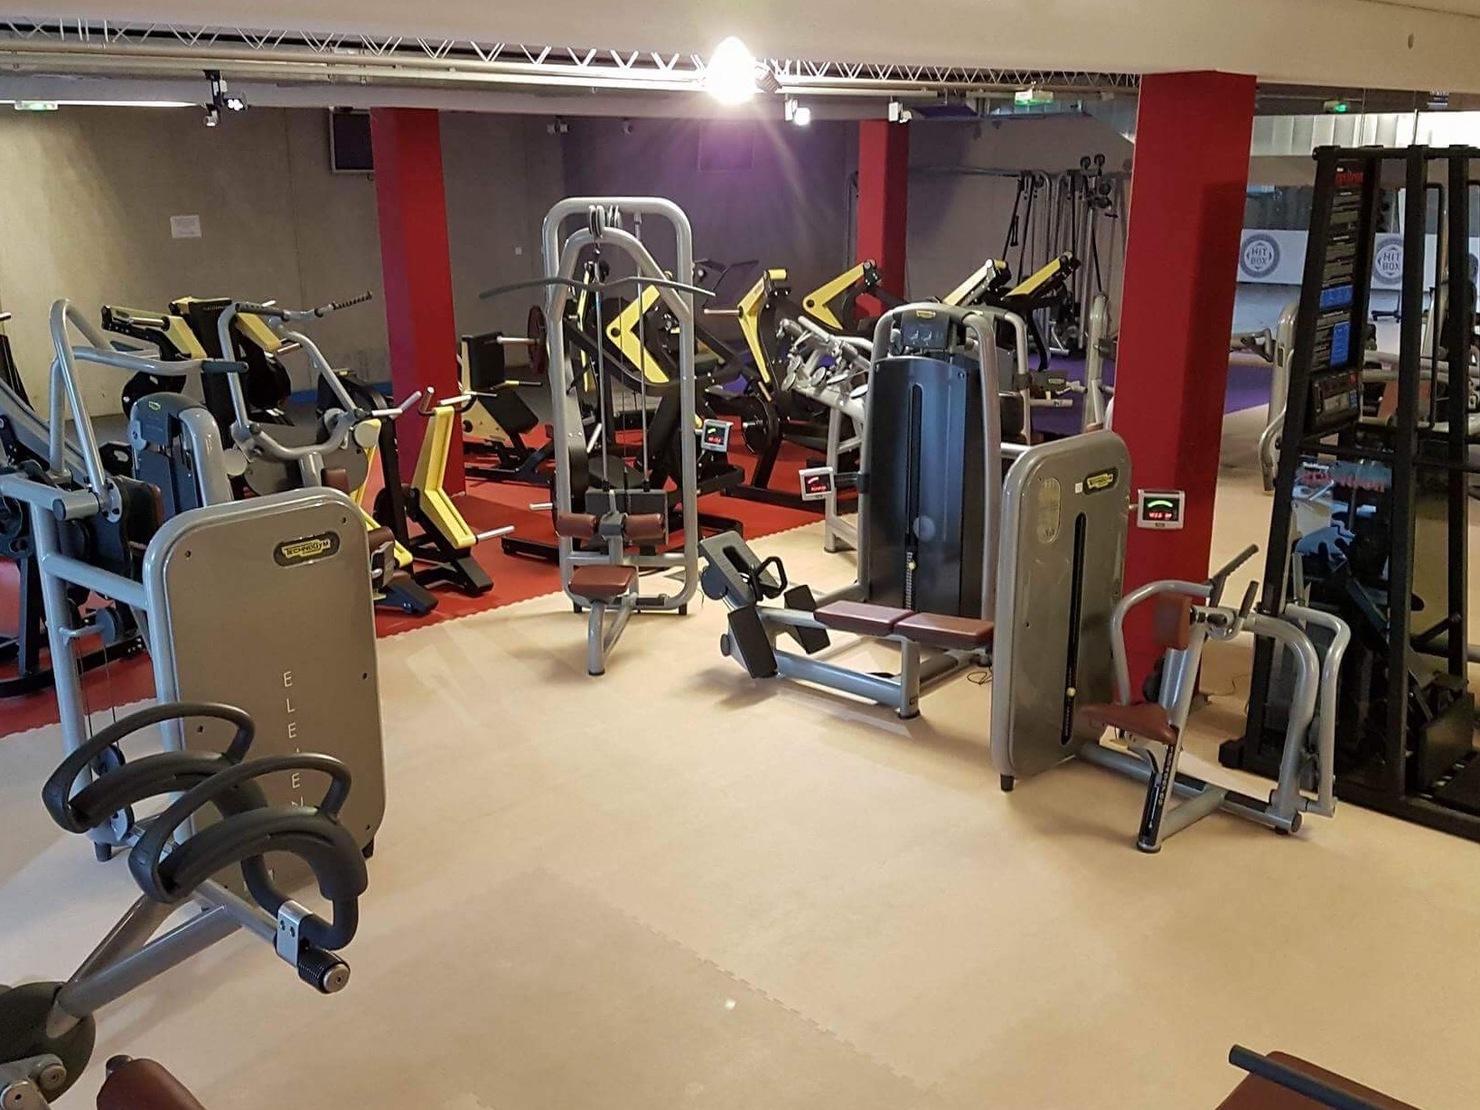 aqua fitness colmar logelbach wintzenheim tarifs avis horaires essai gratuit. Black Bedroom Furniture Sets. Home Design Ideas